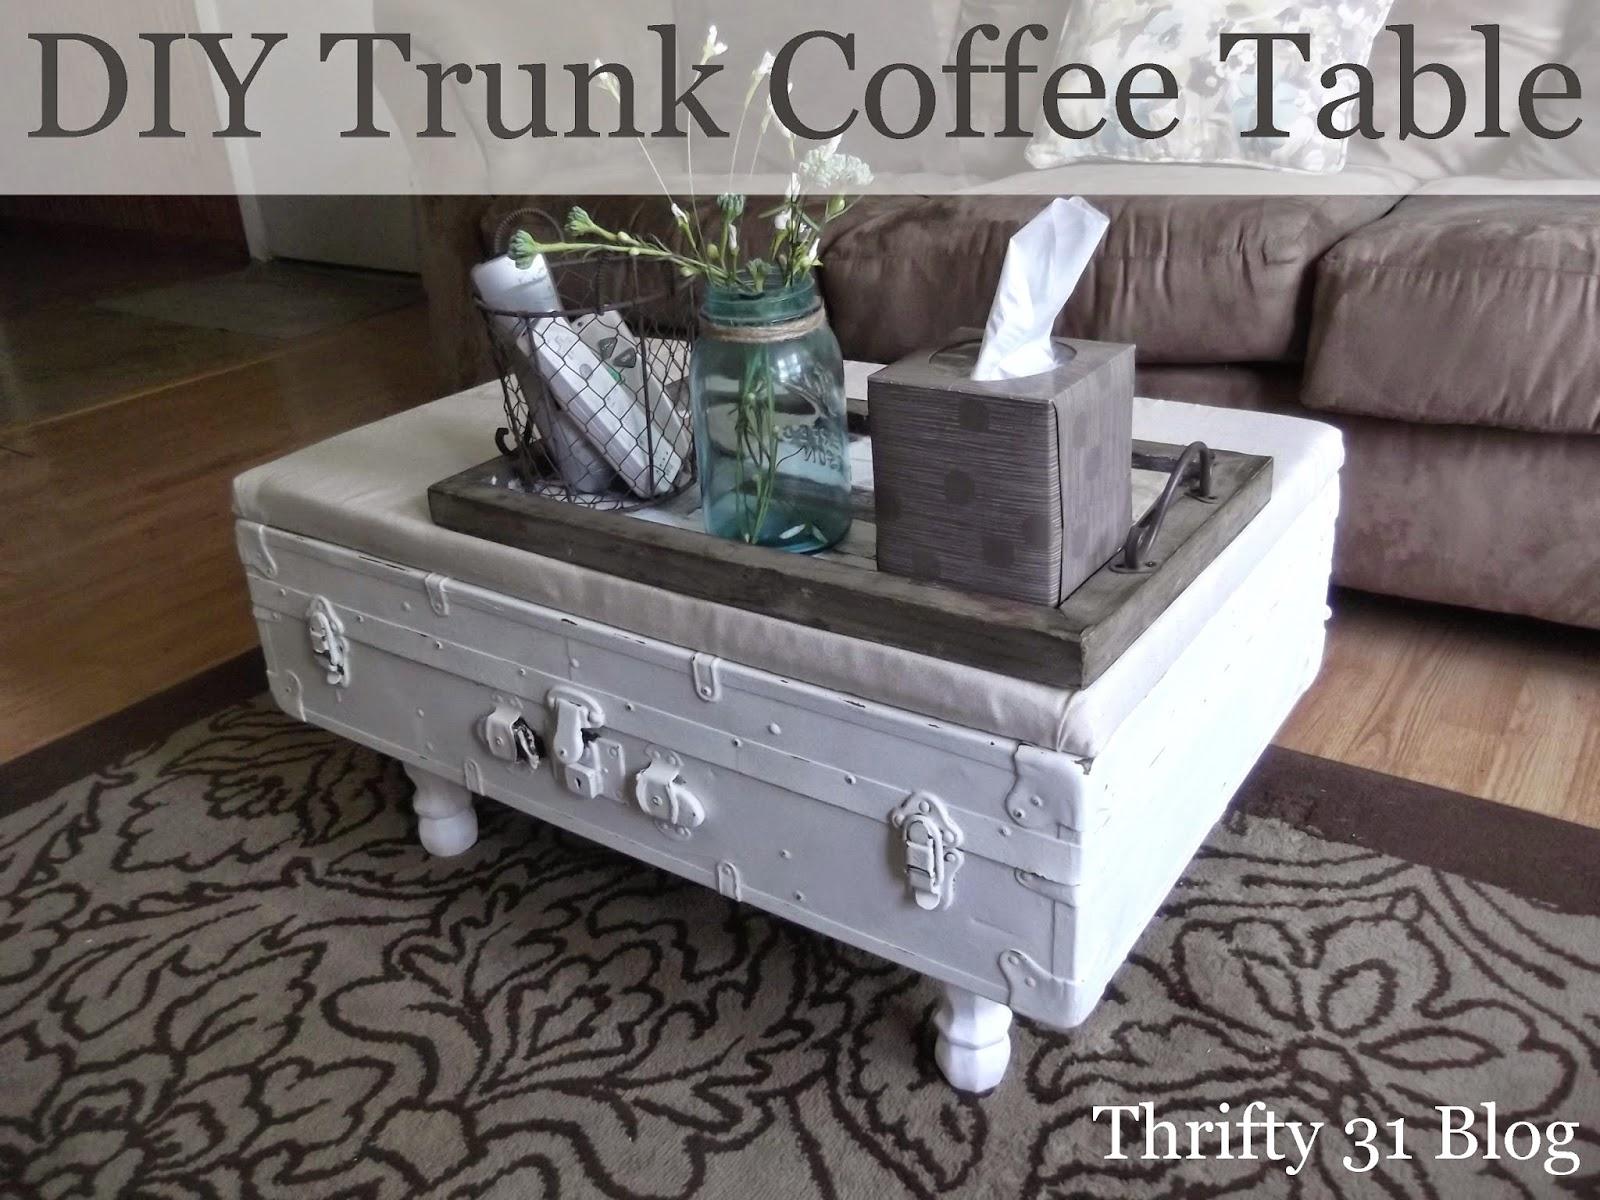 Thrifty 31 Blog Diy Trunk Coffee Table